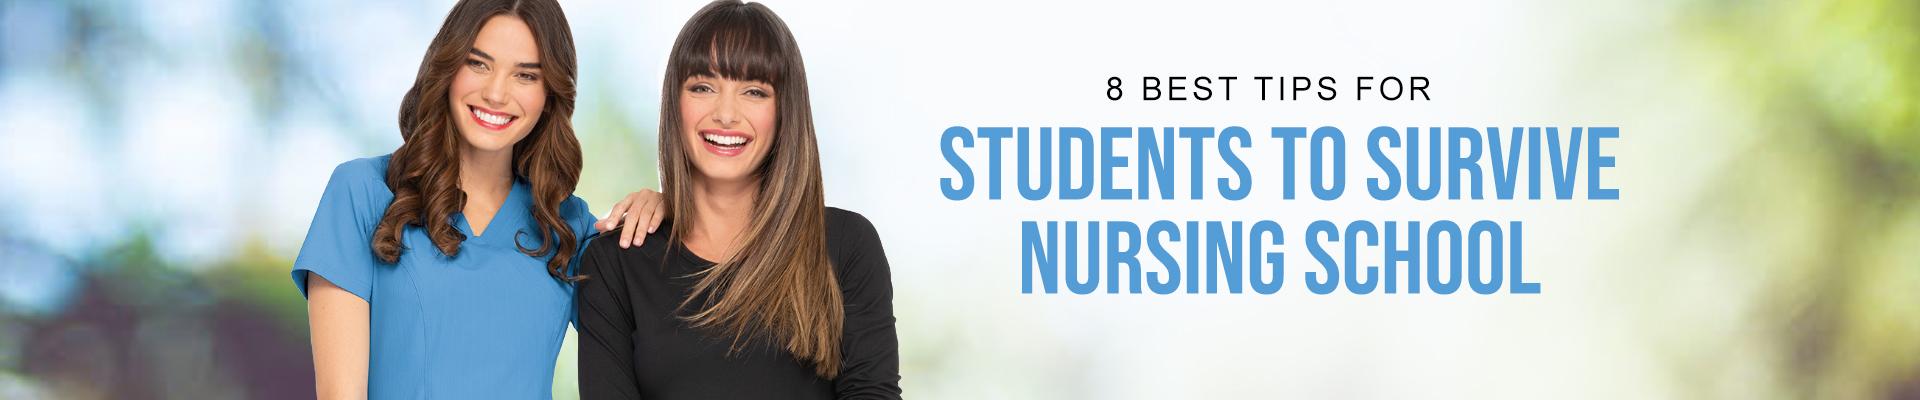 8 Best Tips to Survive Nursing School